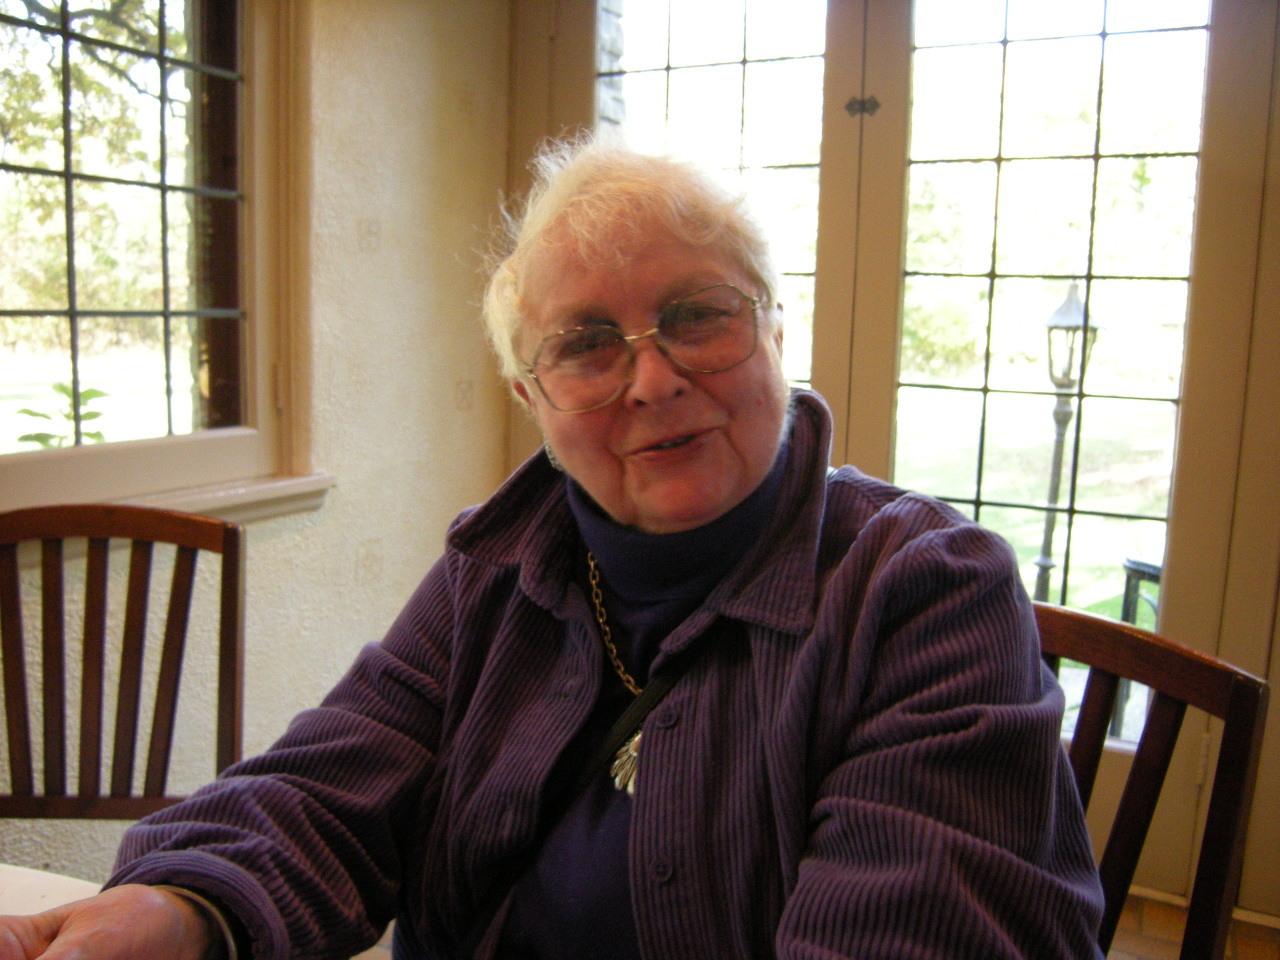 Julie Marylin Gollrad